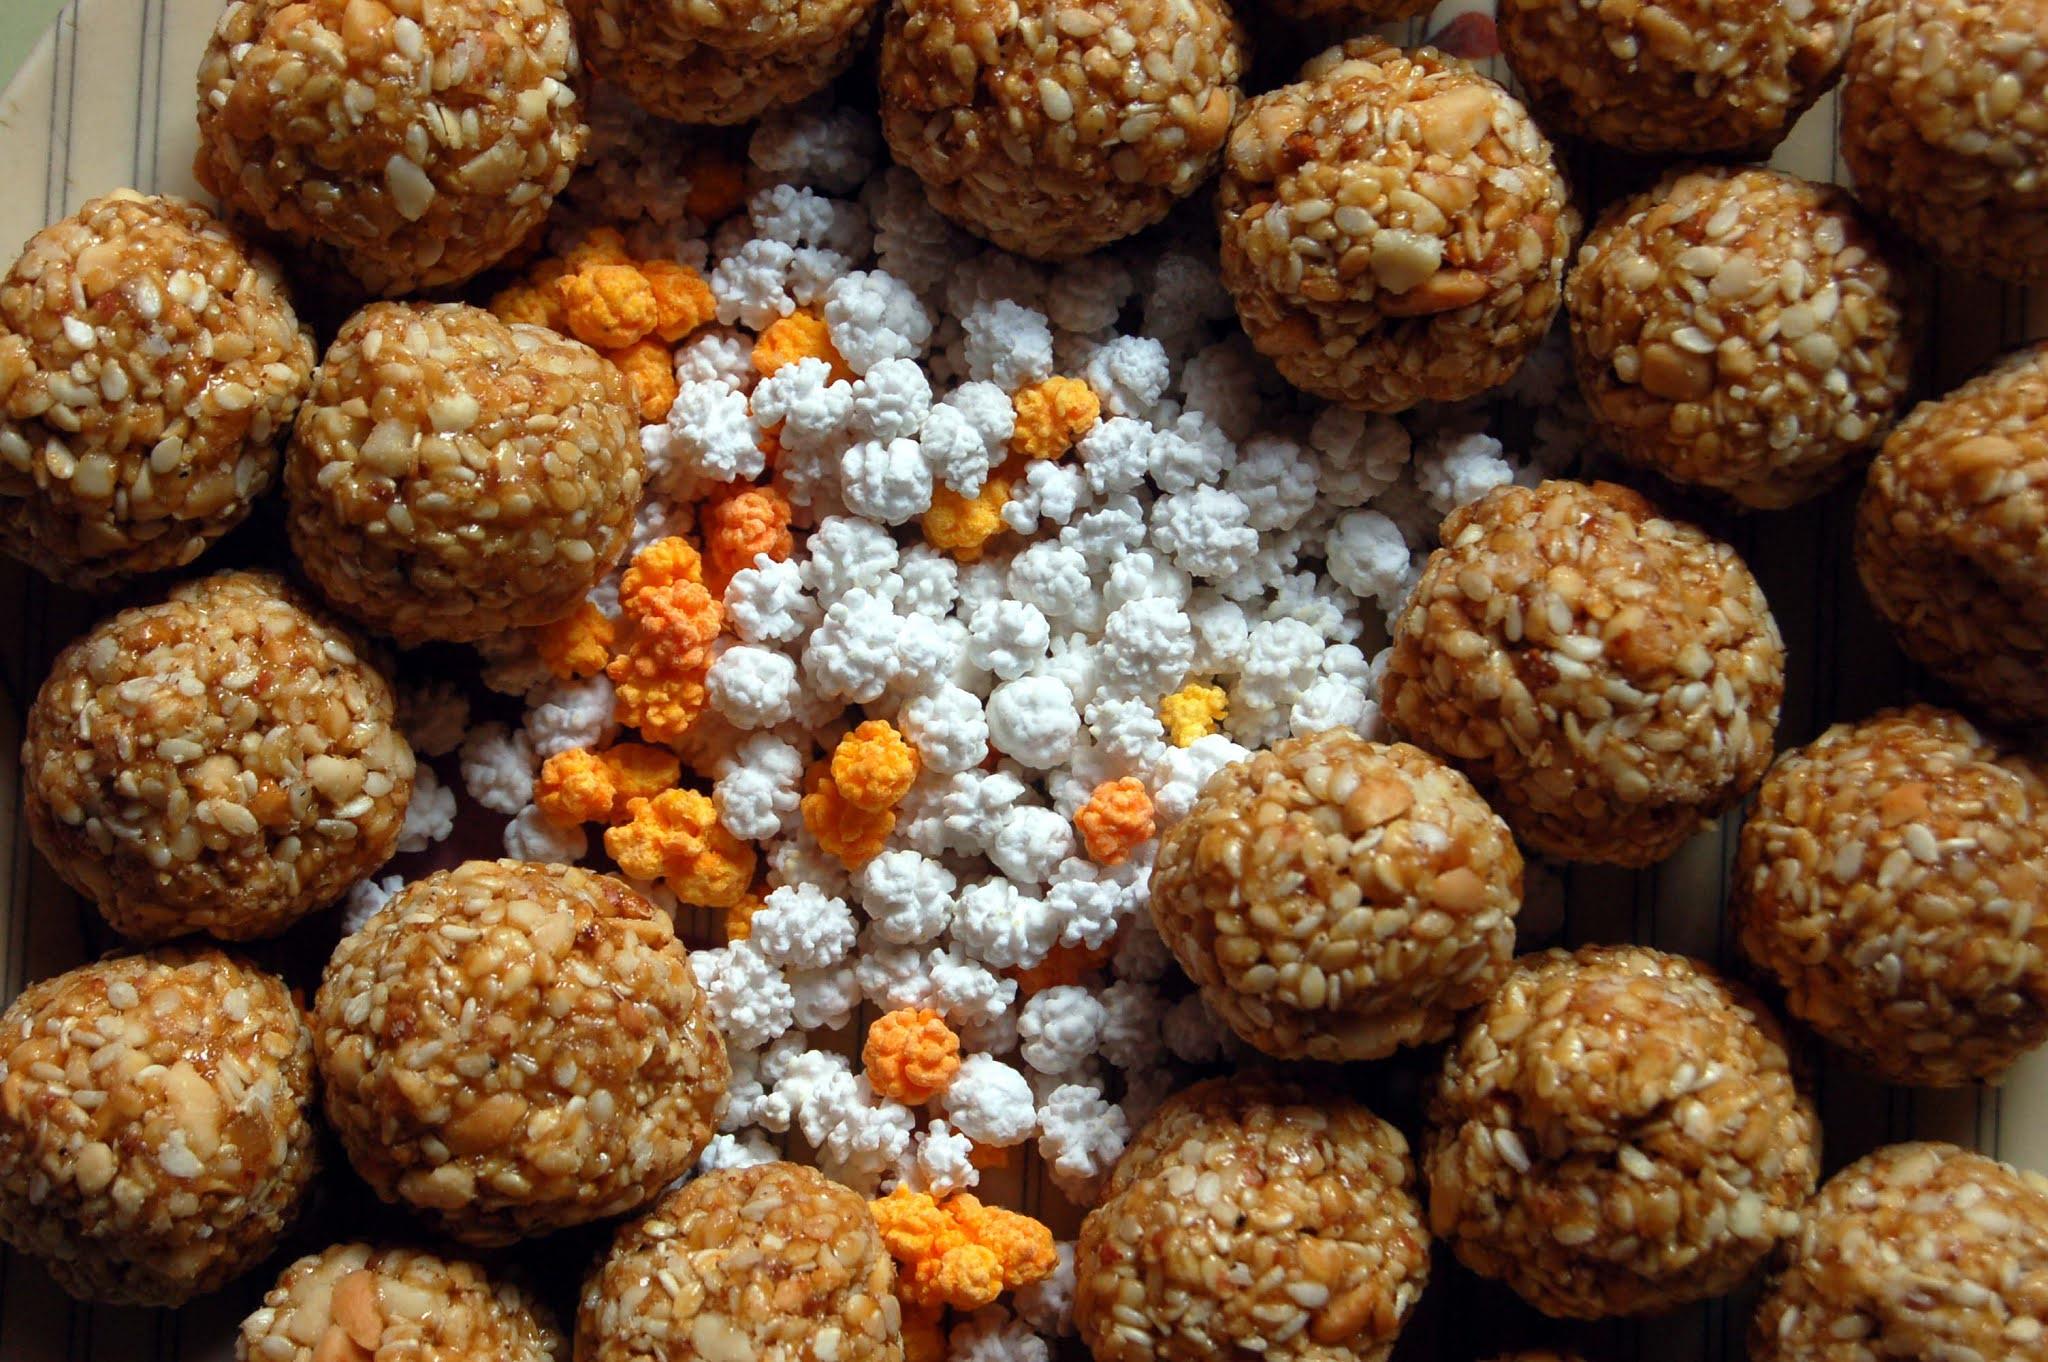 Why does TILGUL consume during Makar Sankranti?